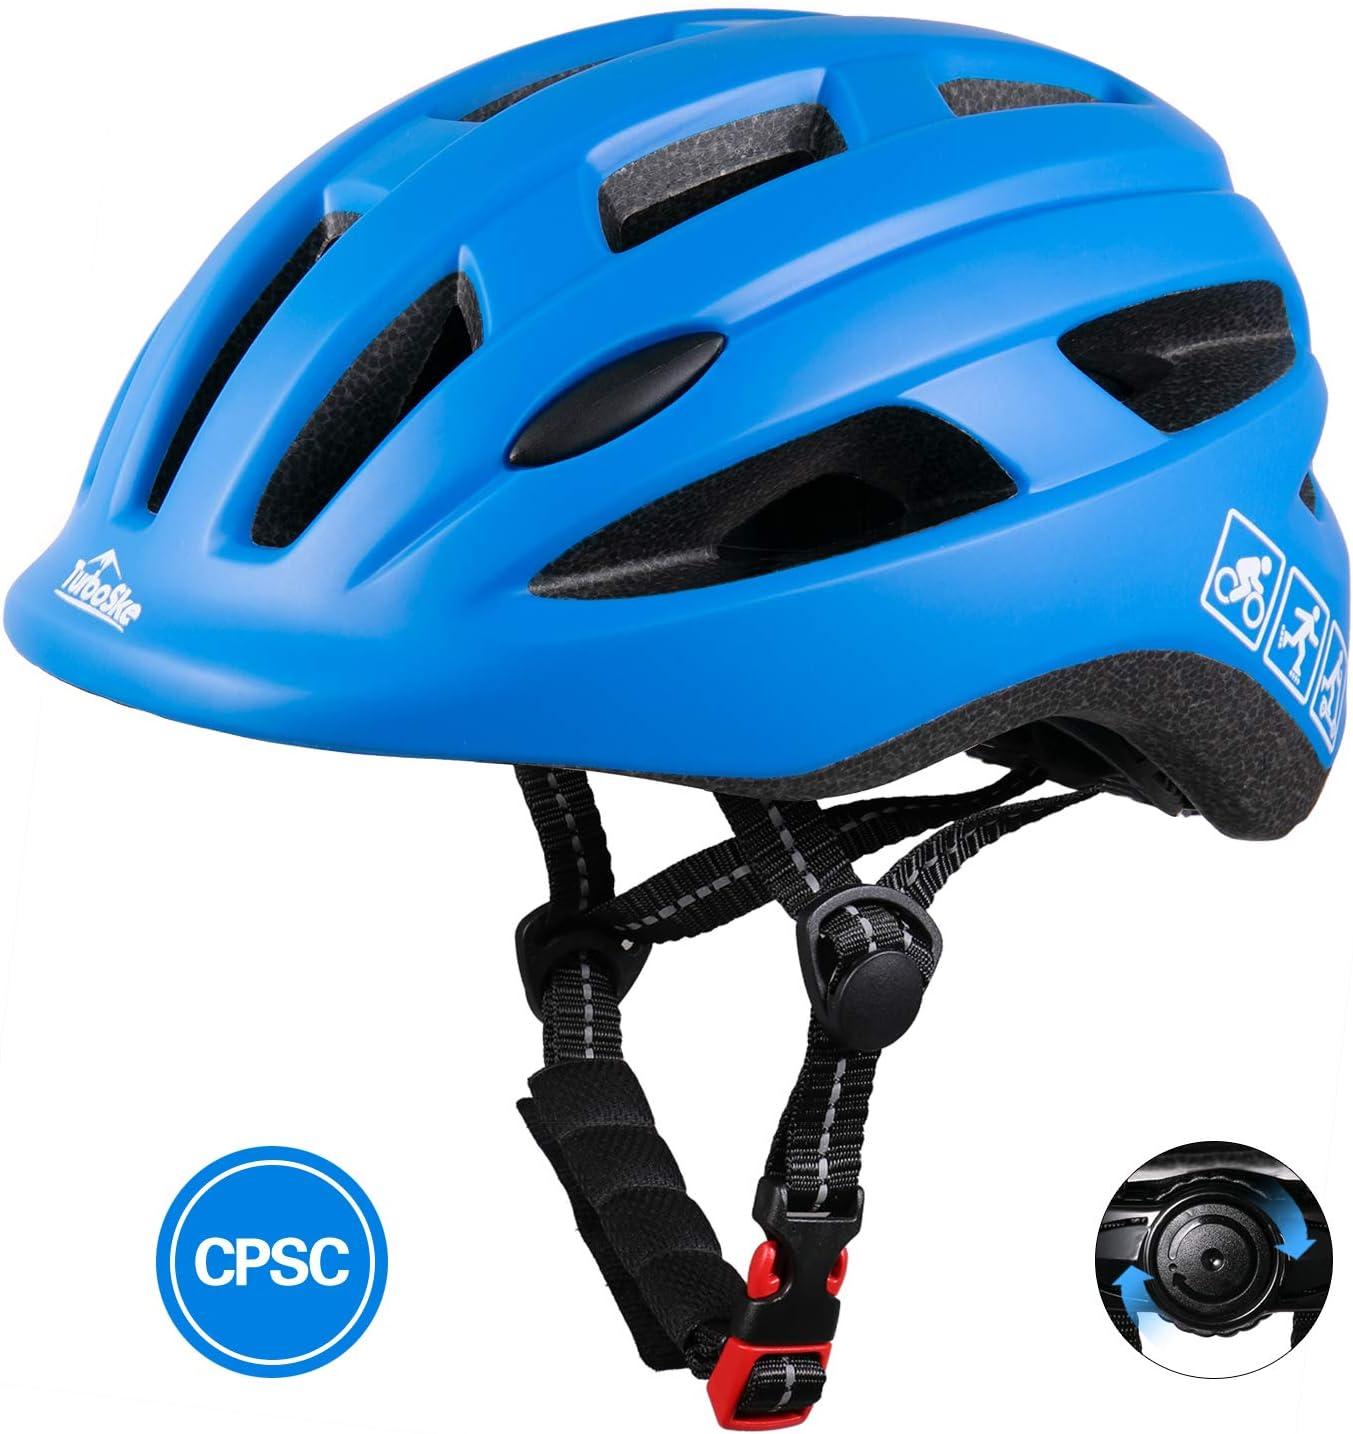 TurboSke Toddler Bike Helmet, CPSC Certified Multi-Sport Adjustable Helmet for Kids Boys and Girls Age 3-5